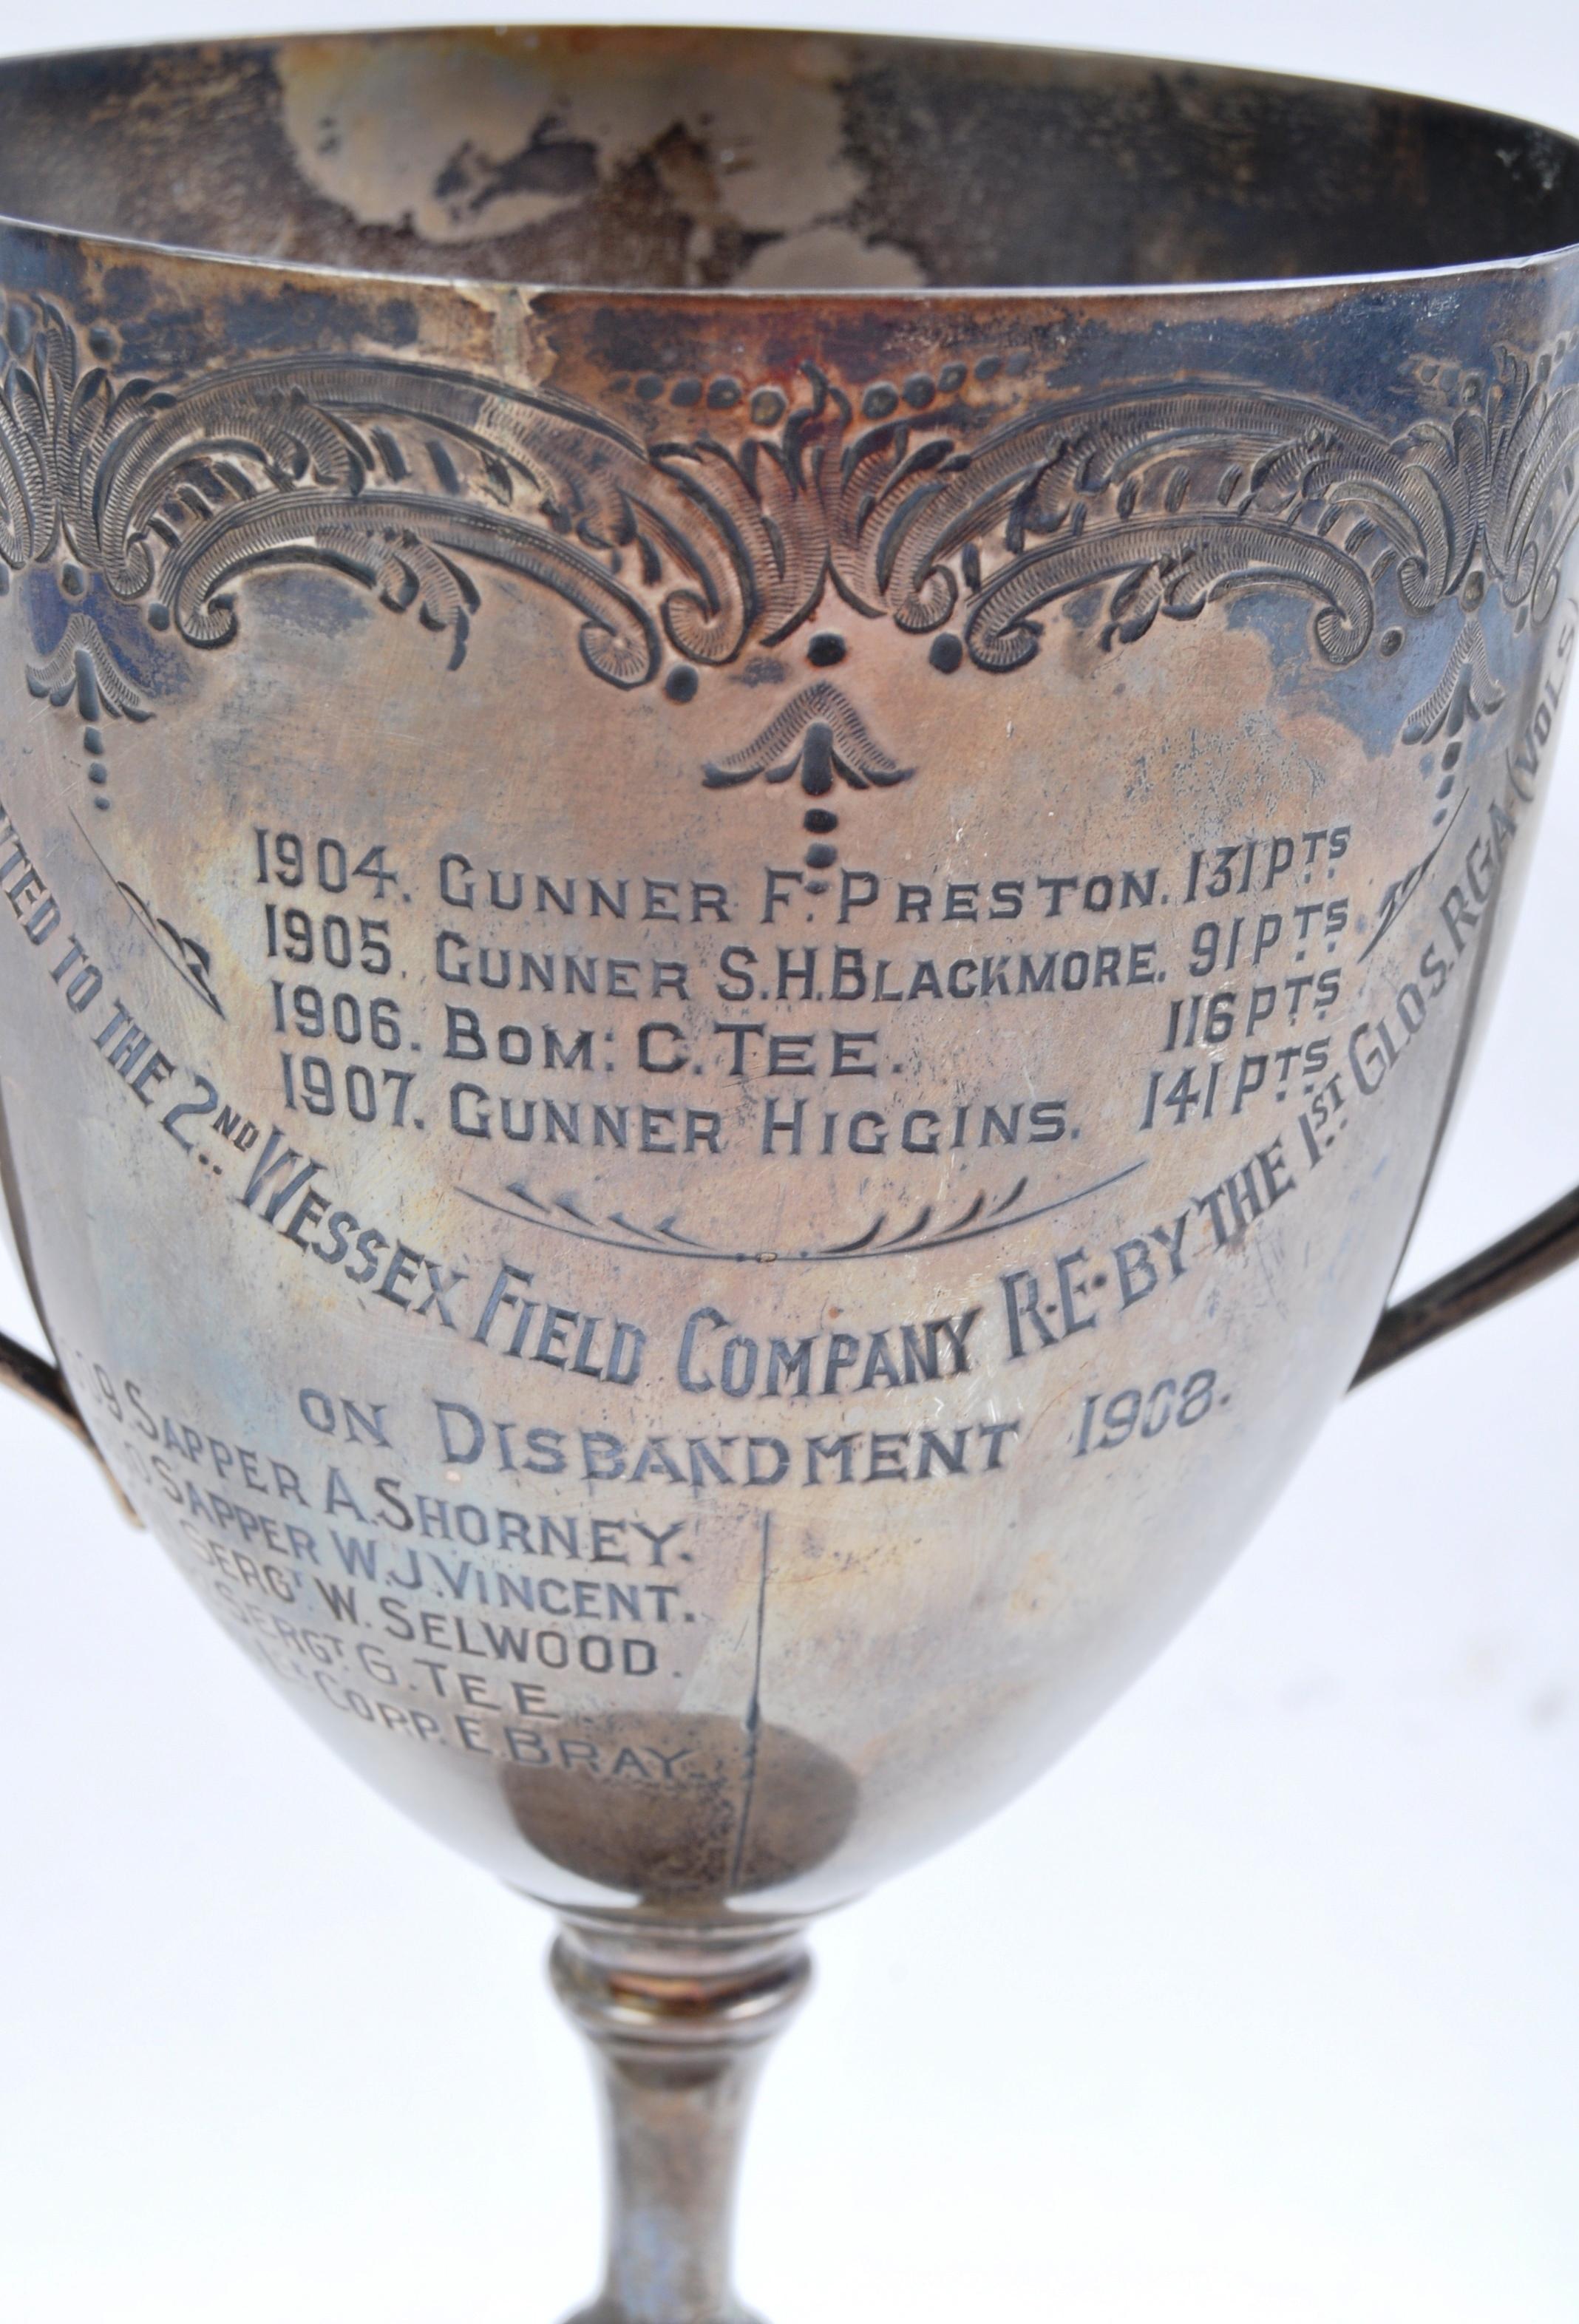 BOER WAR INTEREST - 2ND WESSEX FIELD COMPANY LARGE SILVER TROPHY - Image 6 of 8